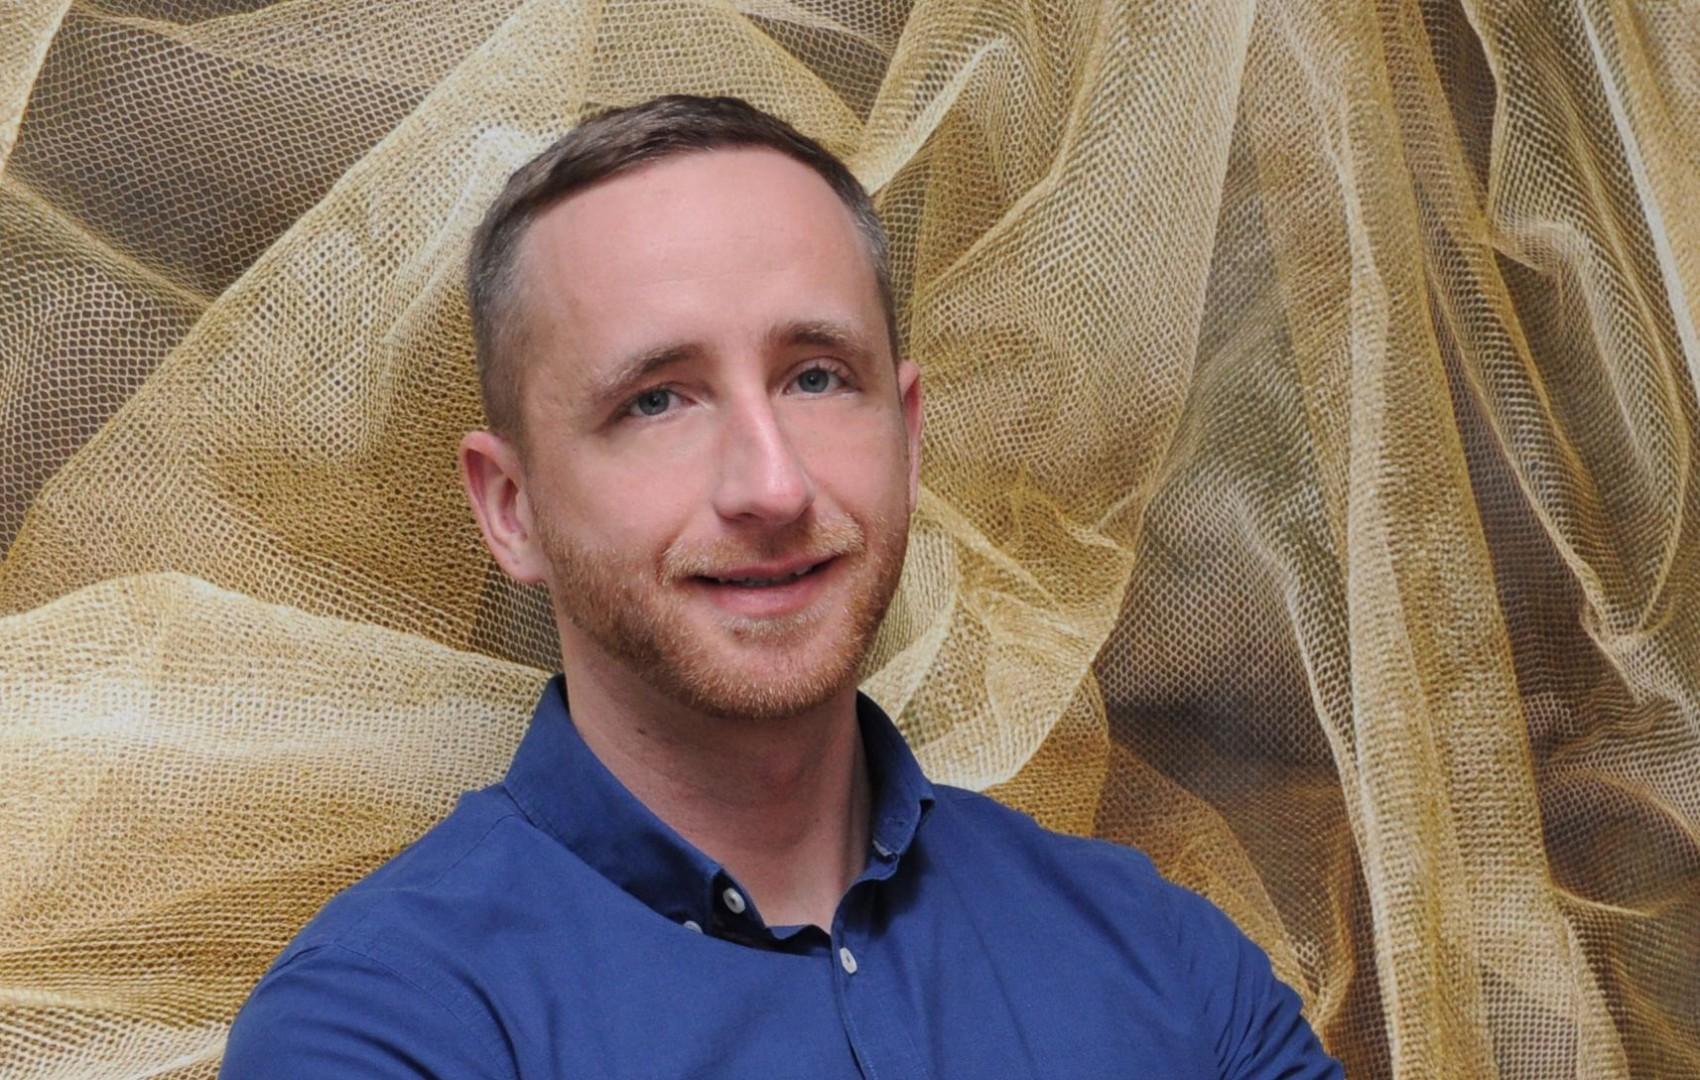 Miłosz Matelski, menedżer designu i marketingu produktu w firmie Schattdecor. Fot. Schattdecor